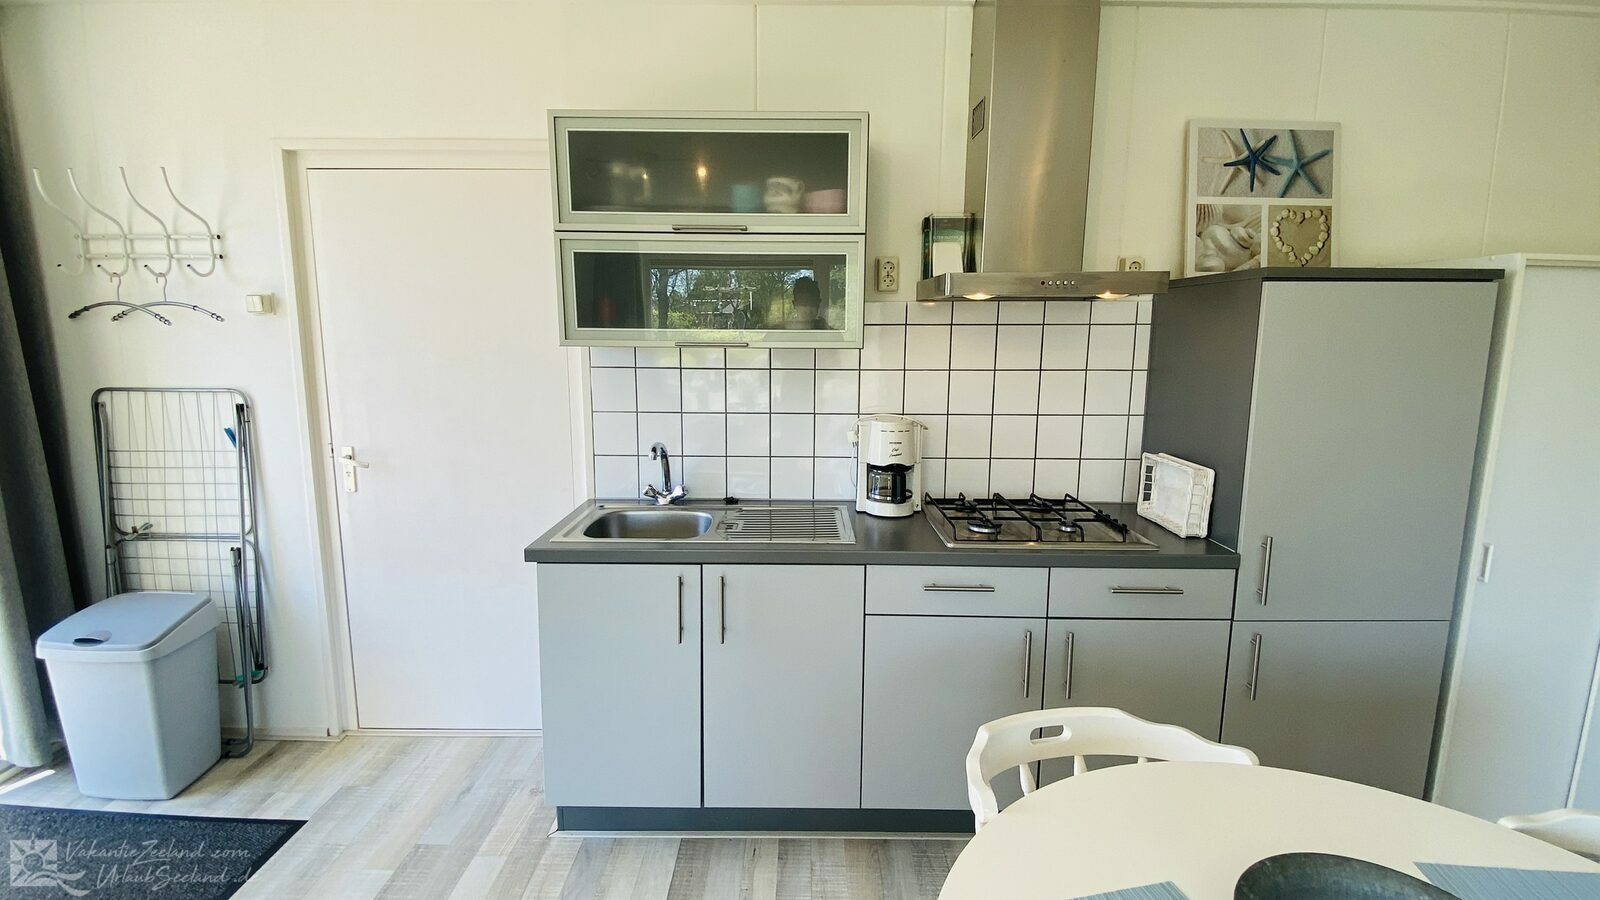 VZ177 Studio Apartment Vrouwenpolder